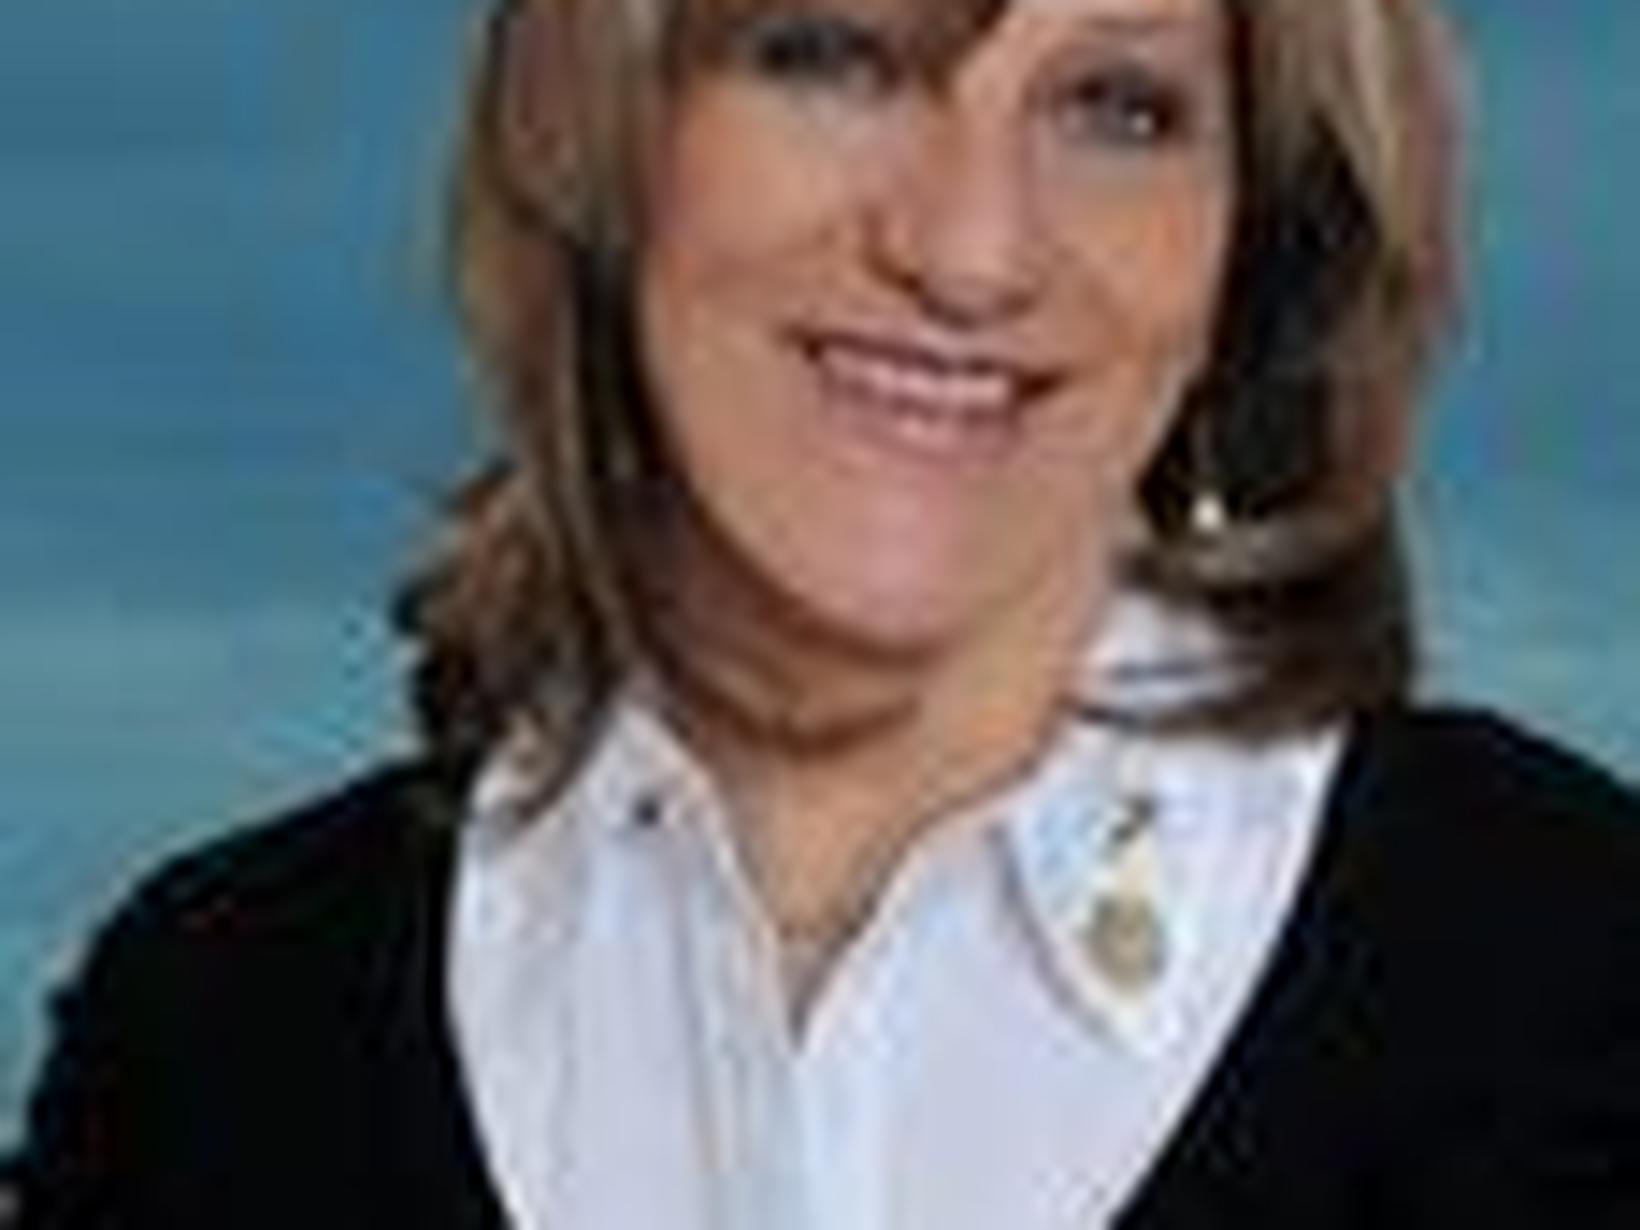 Elizabeth from Wasaga Beach, Ontario, Canada